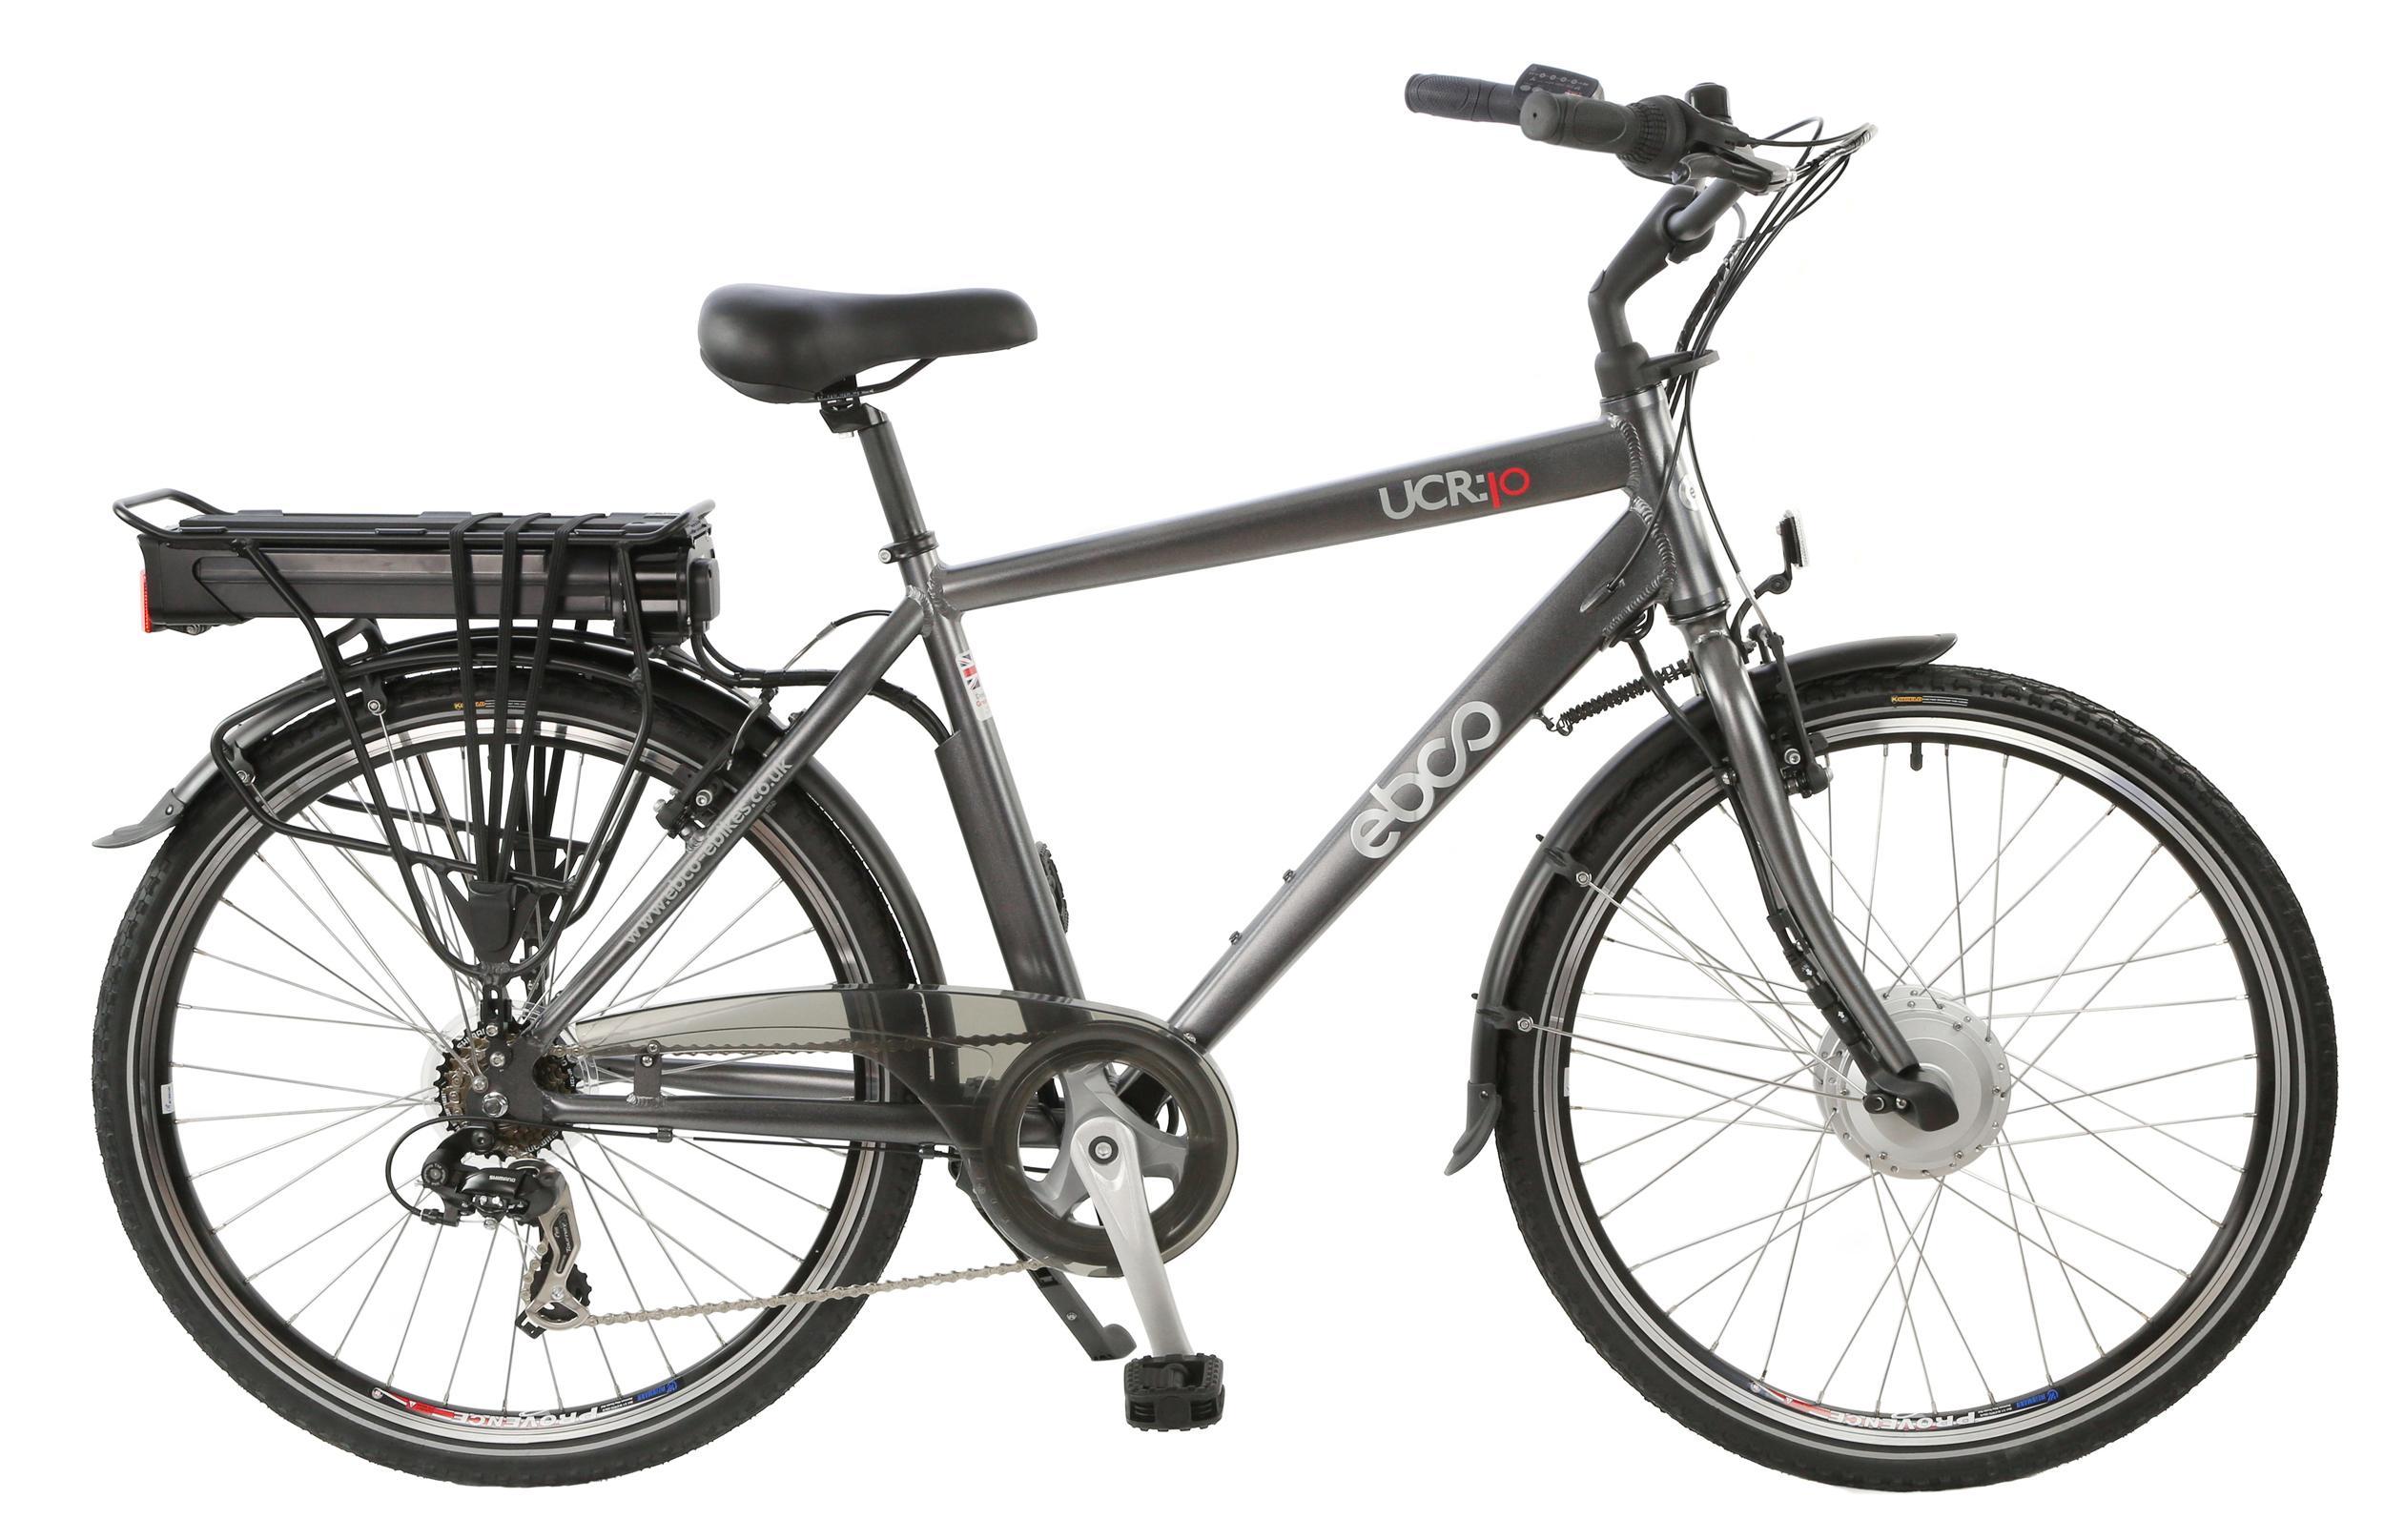 EBCO UCR-10 Womens Mens Unisex Electric Bike 26